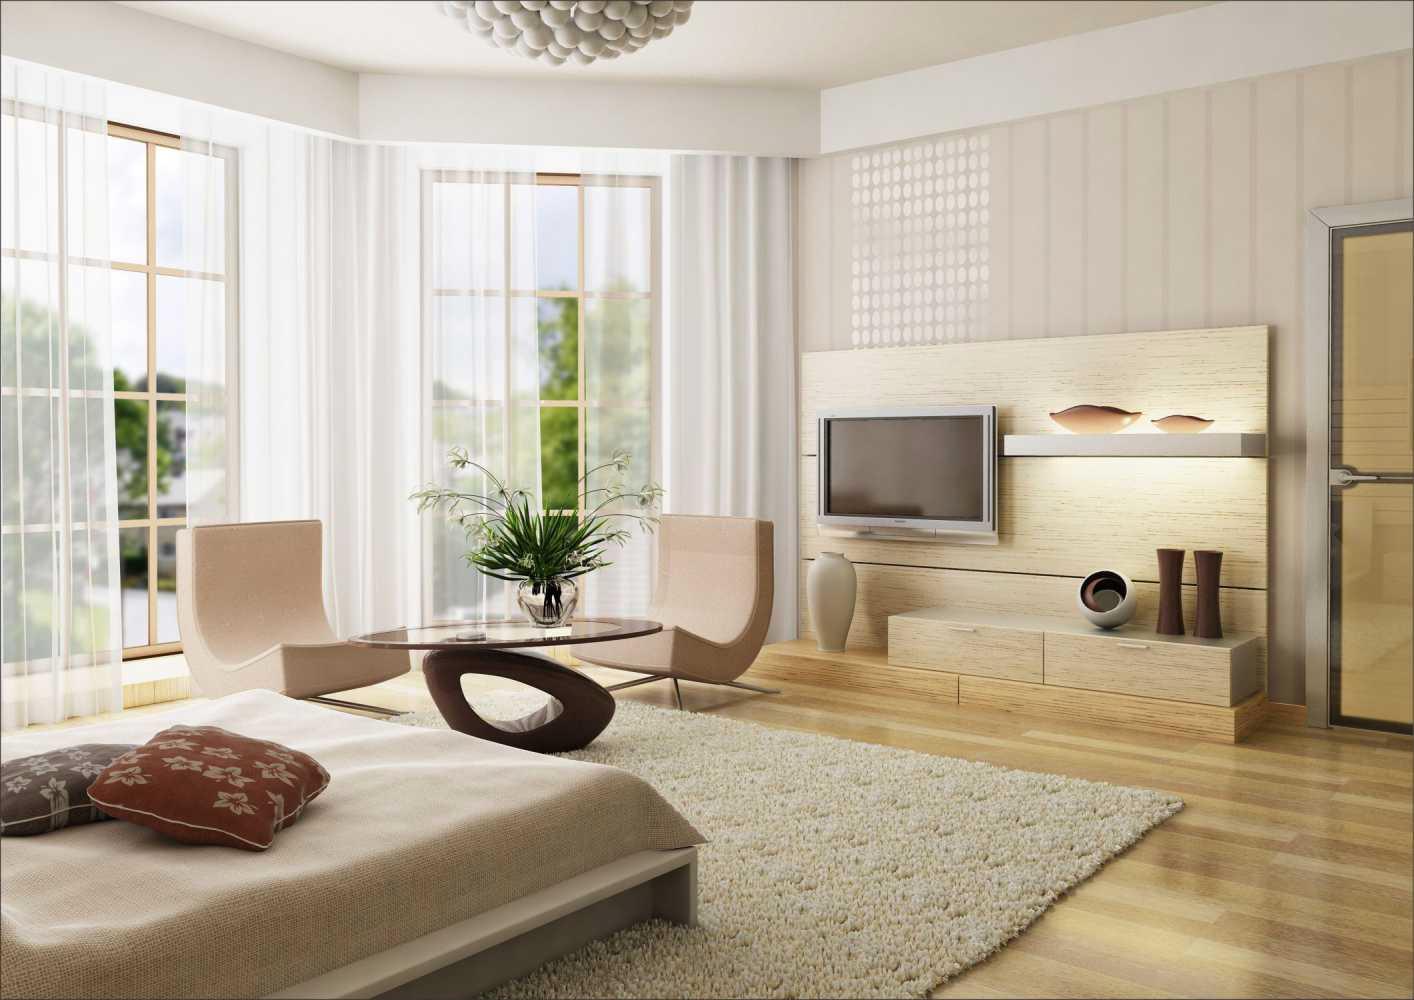 apartment-interiors-Picture-buildlopers-hi-tech-homes-2752611